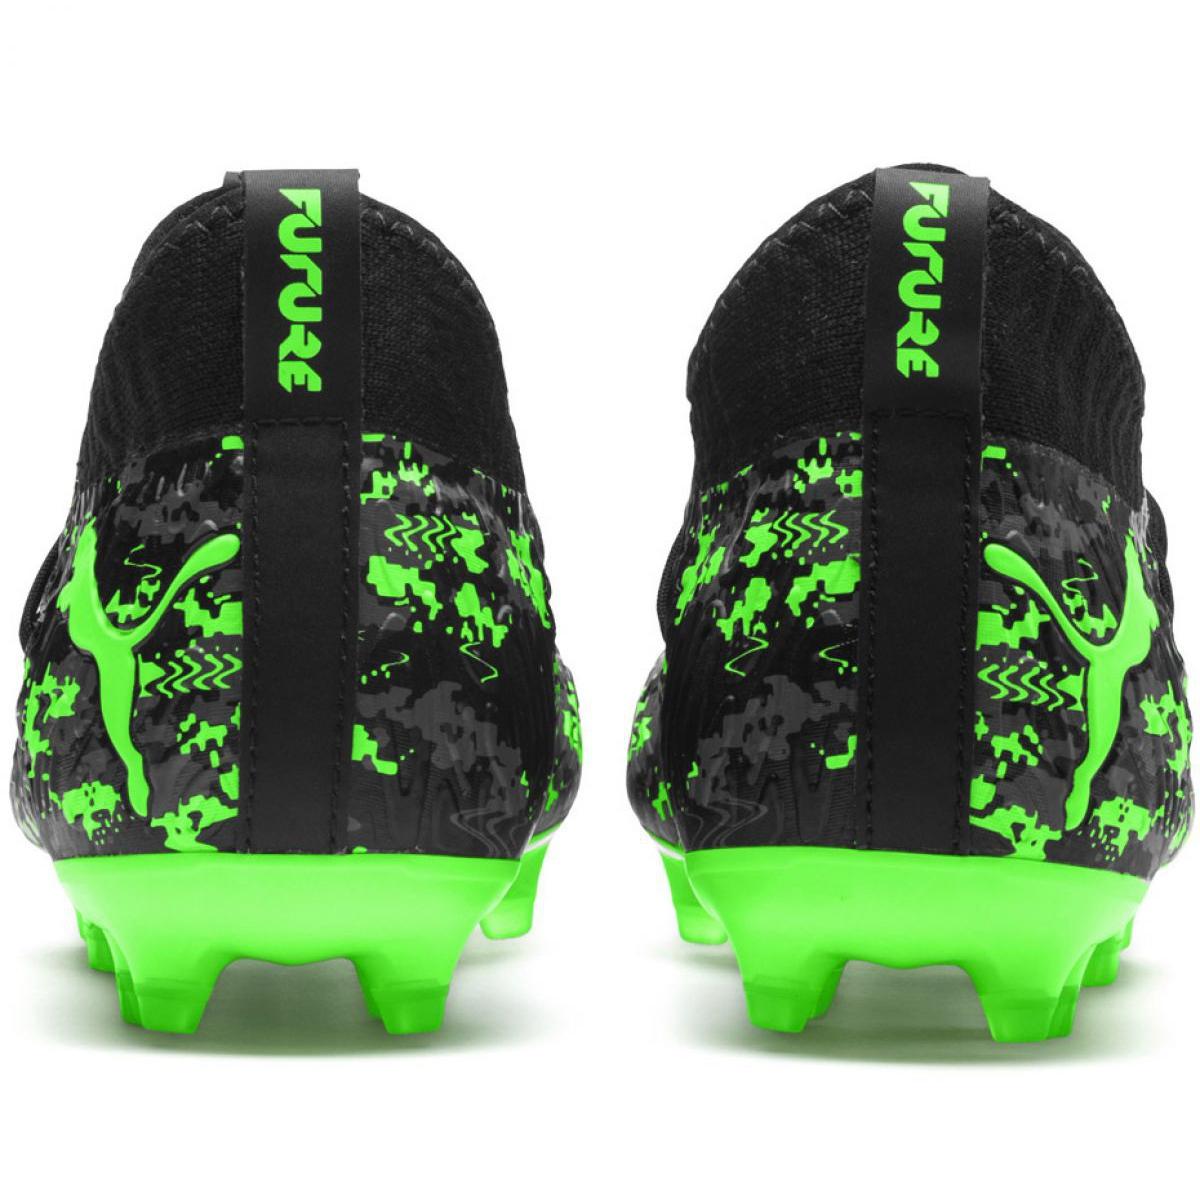 Details about Football boots Puma Future 19.3 Netfit Fg Ag Jr 105551 03 black, green black